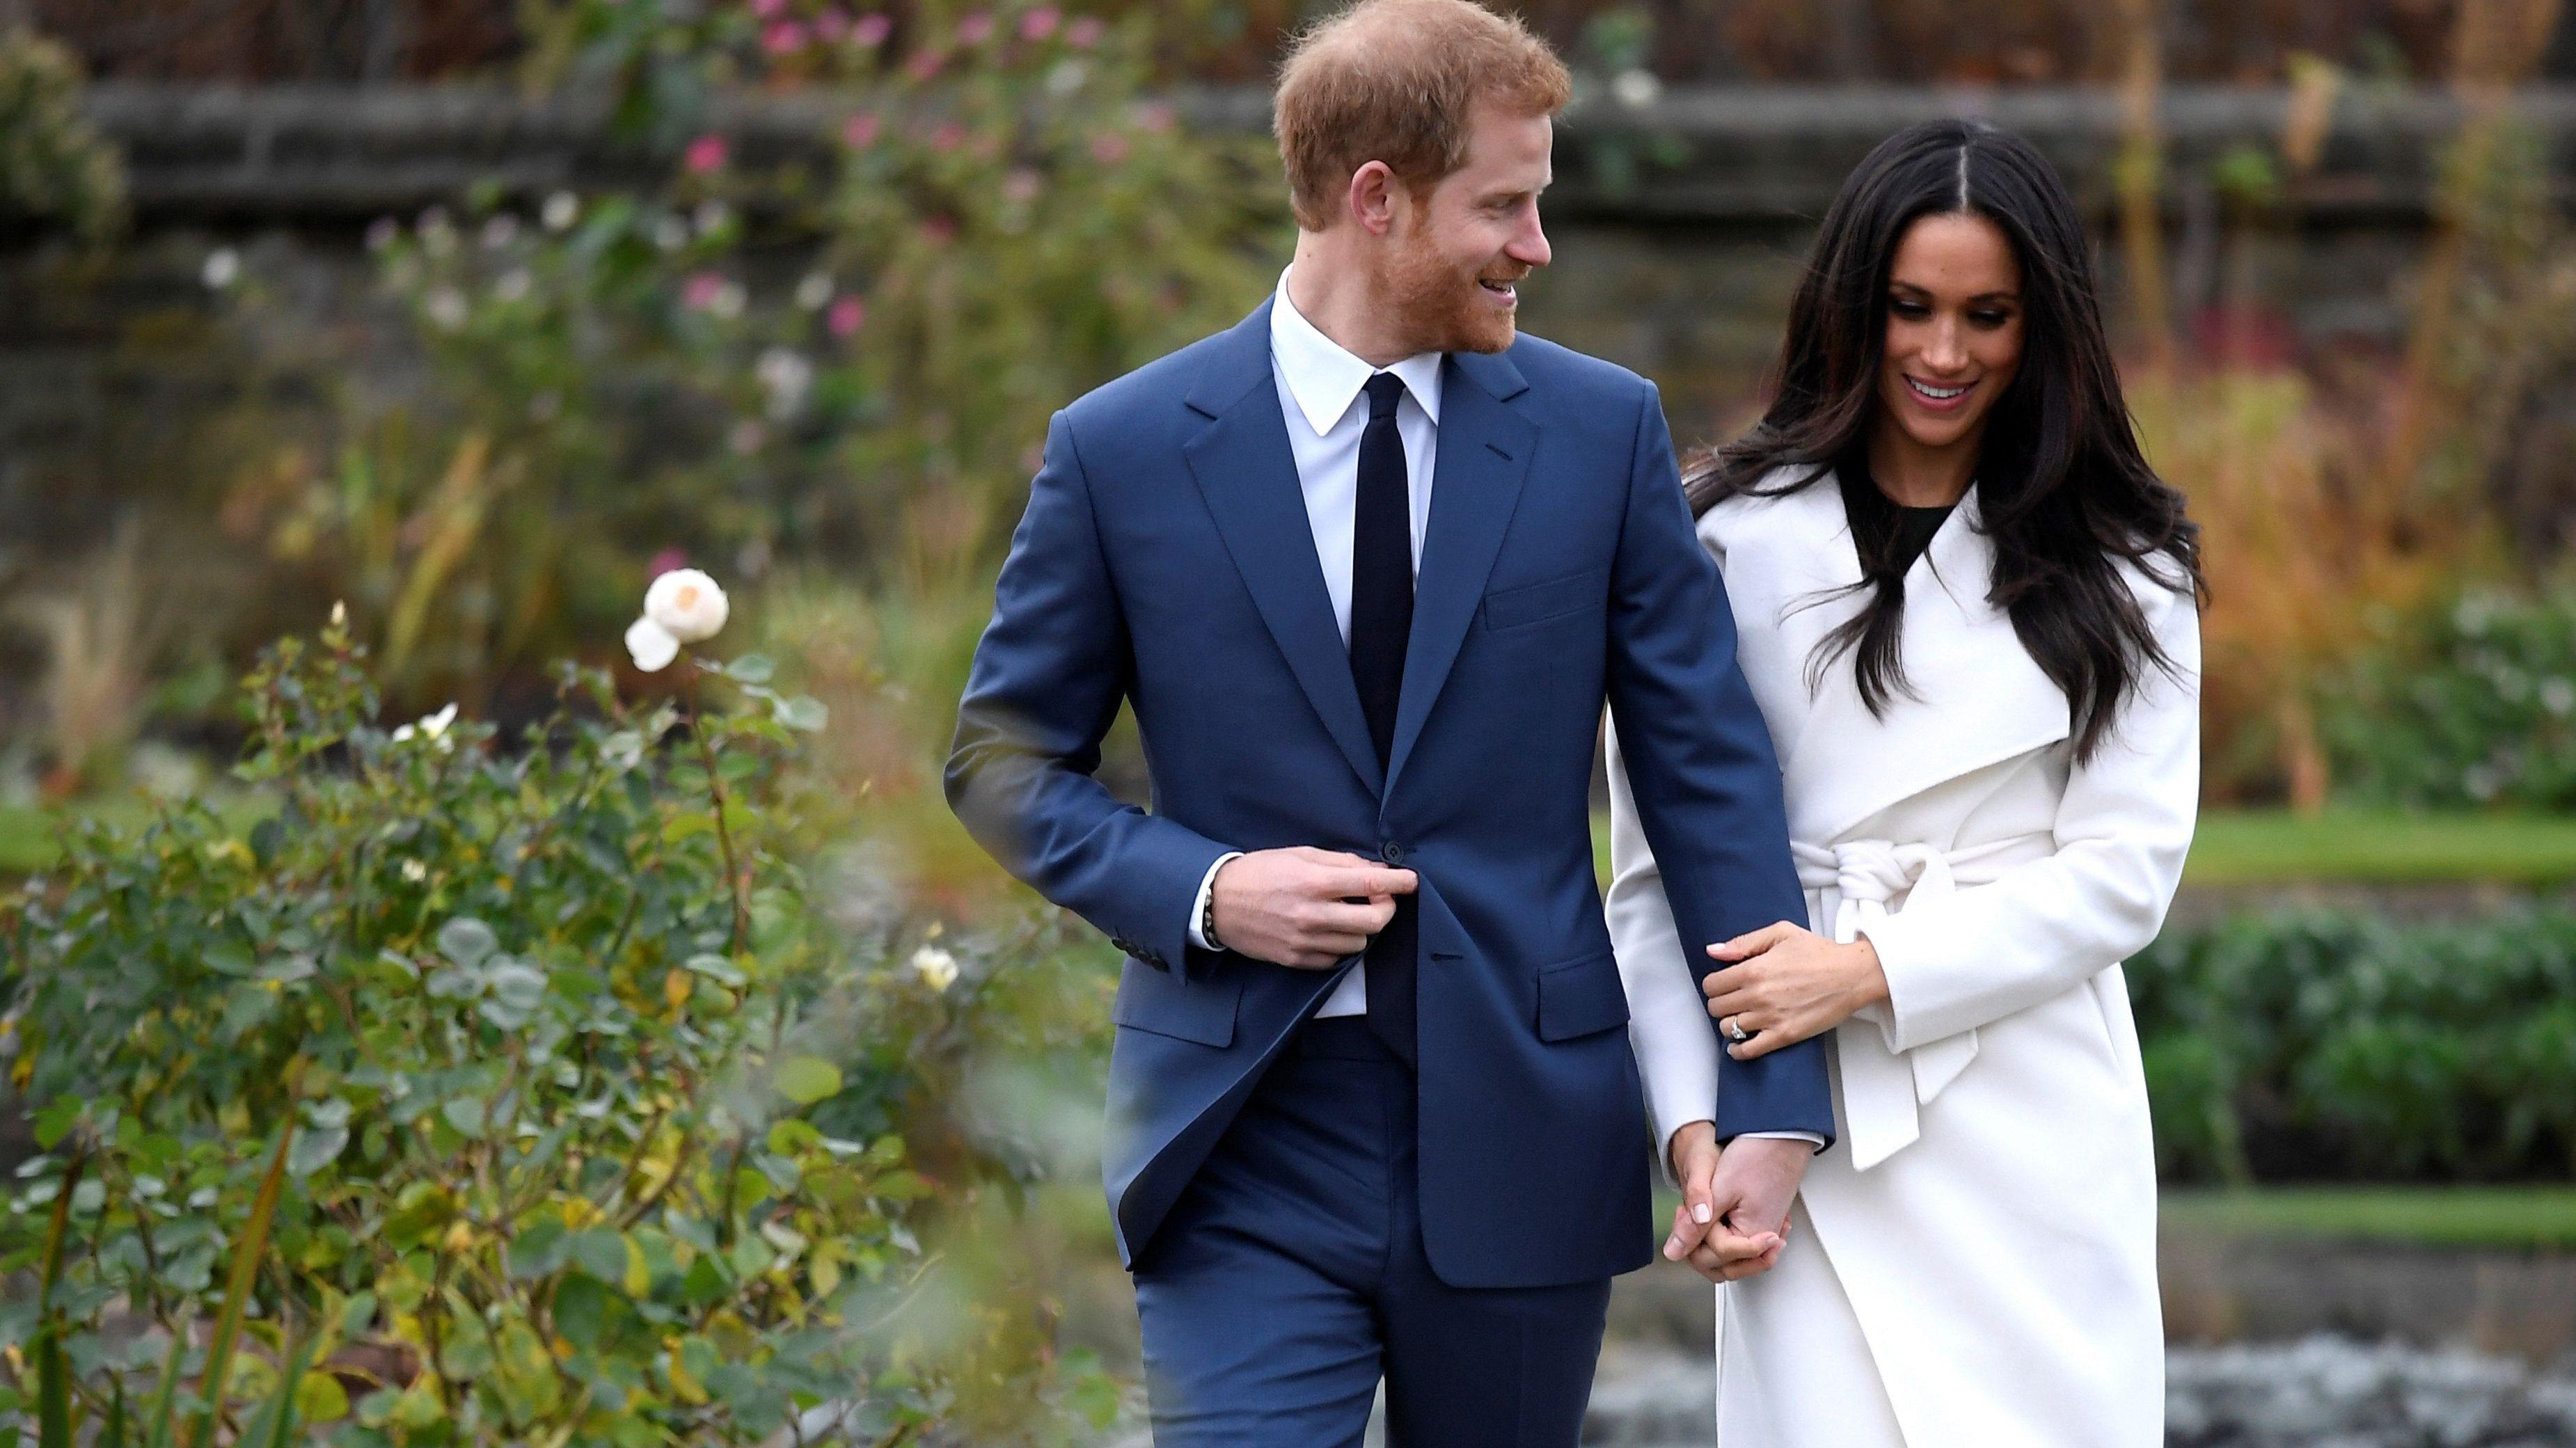 Londen Engeland interracial dating beste dating sites Glasgow